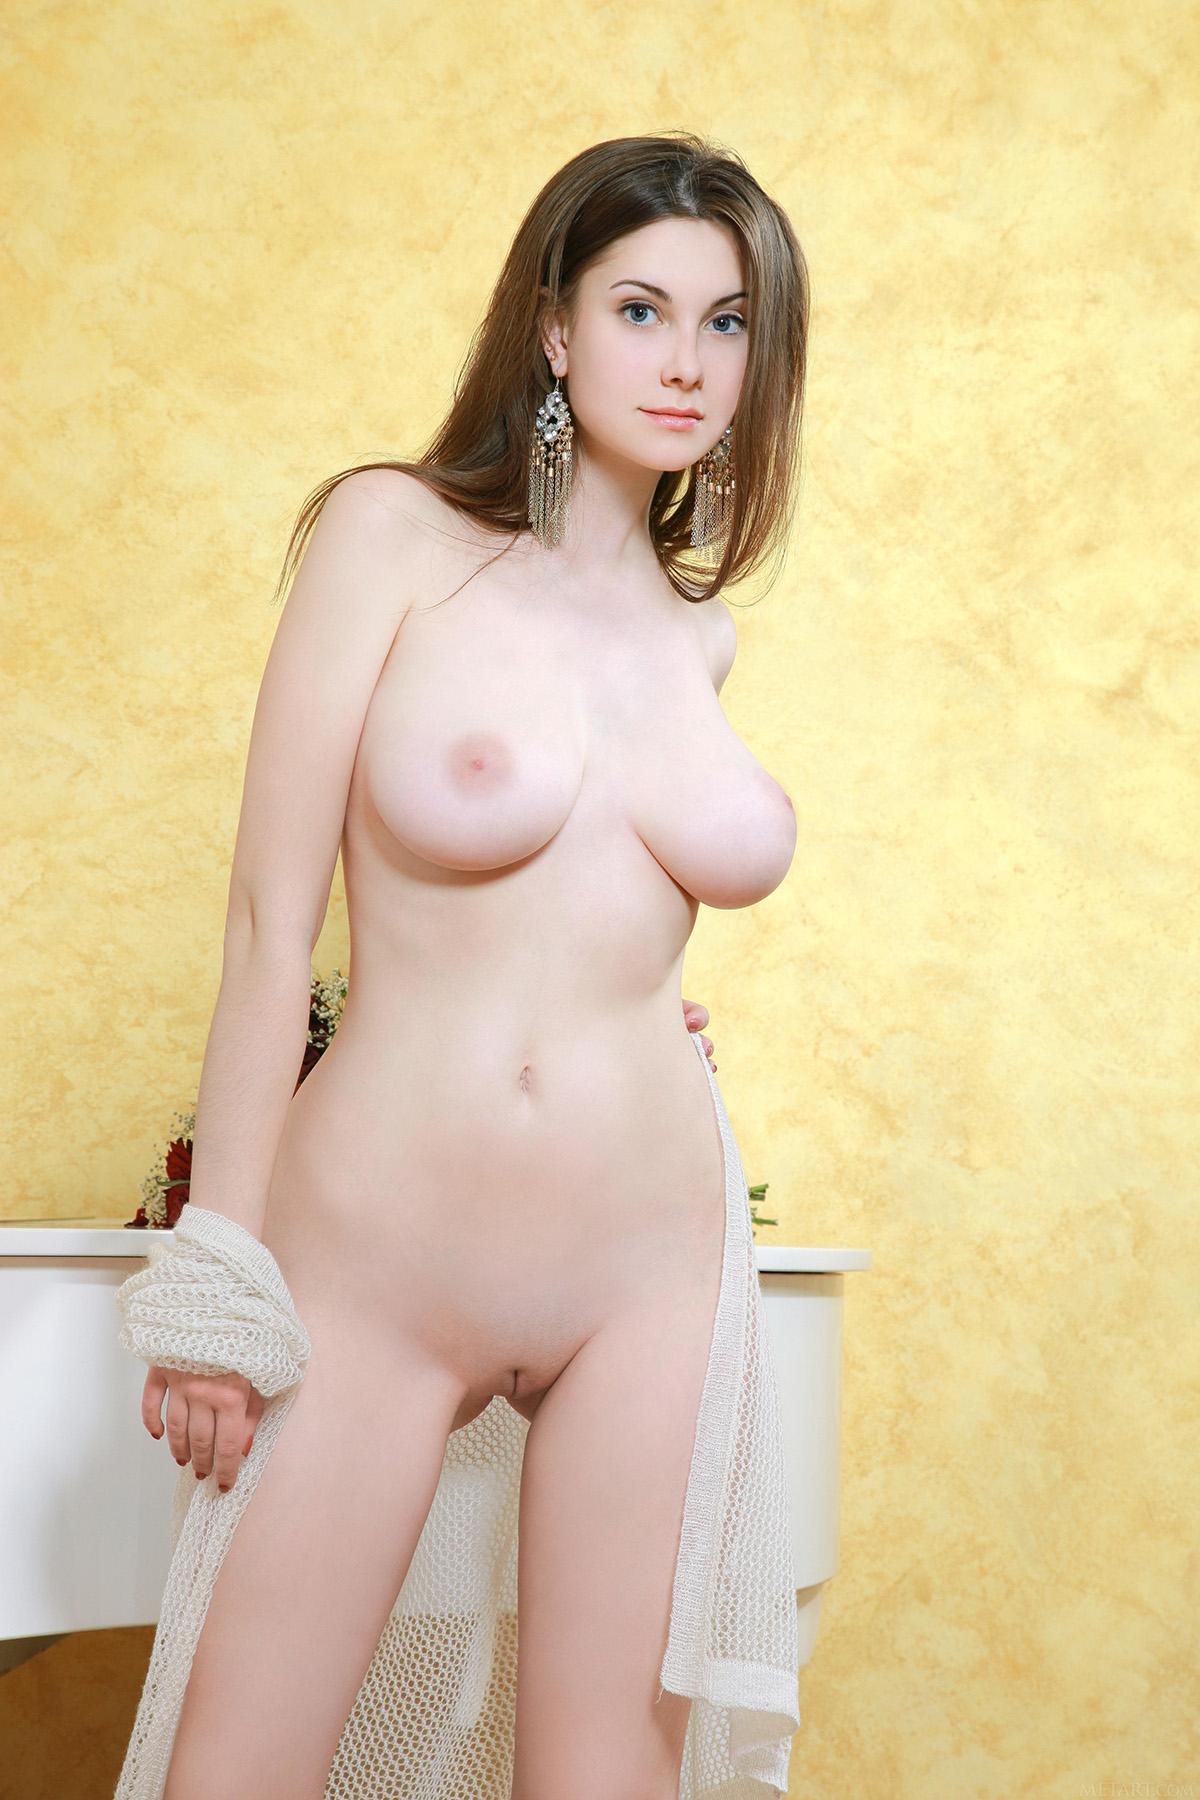 Nude cum loving girls fromuk